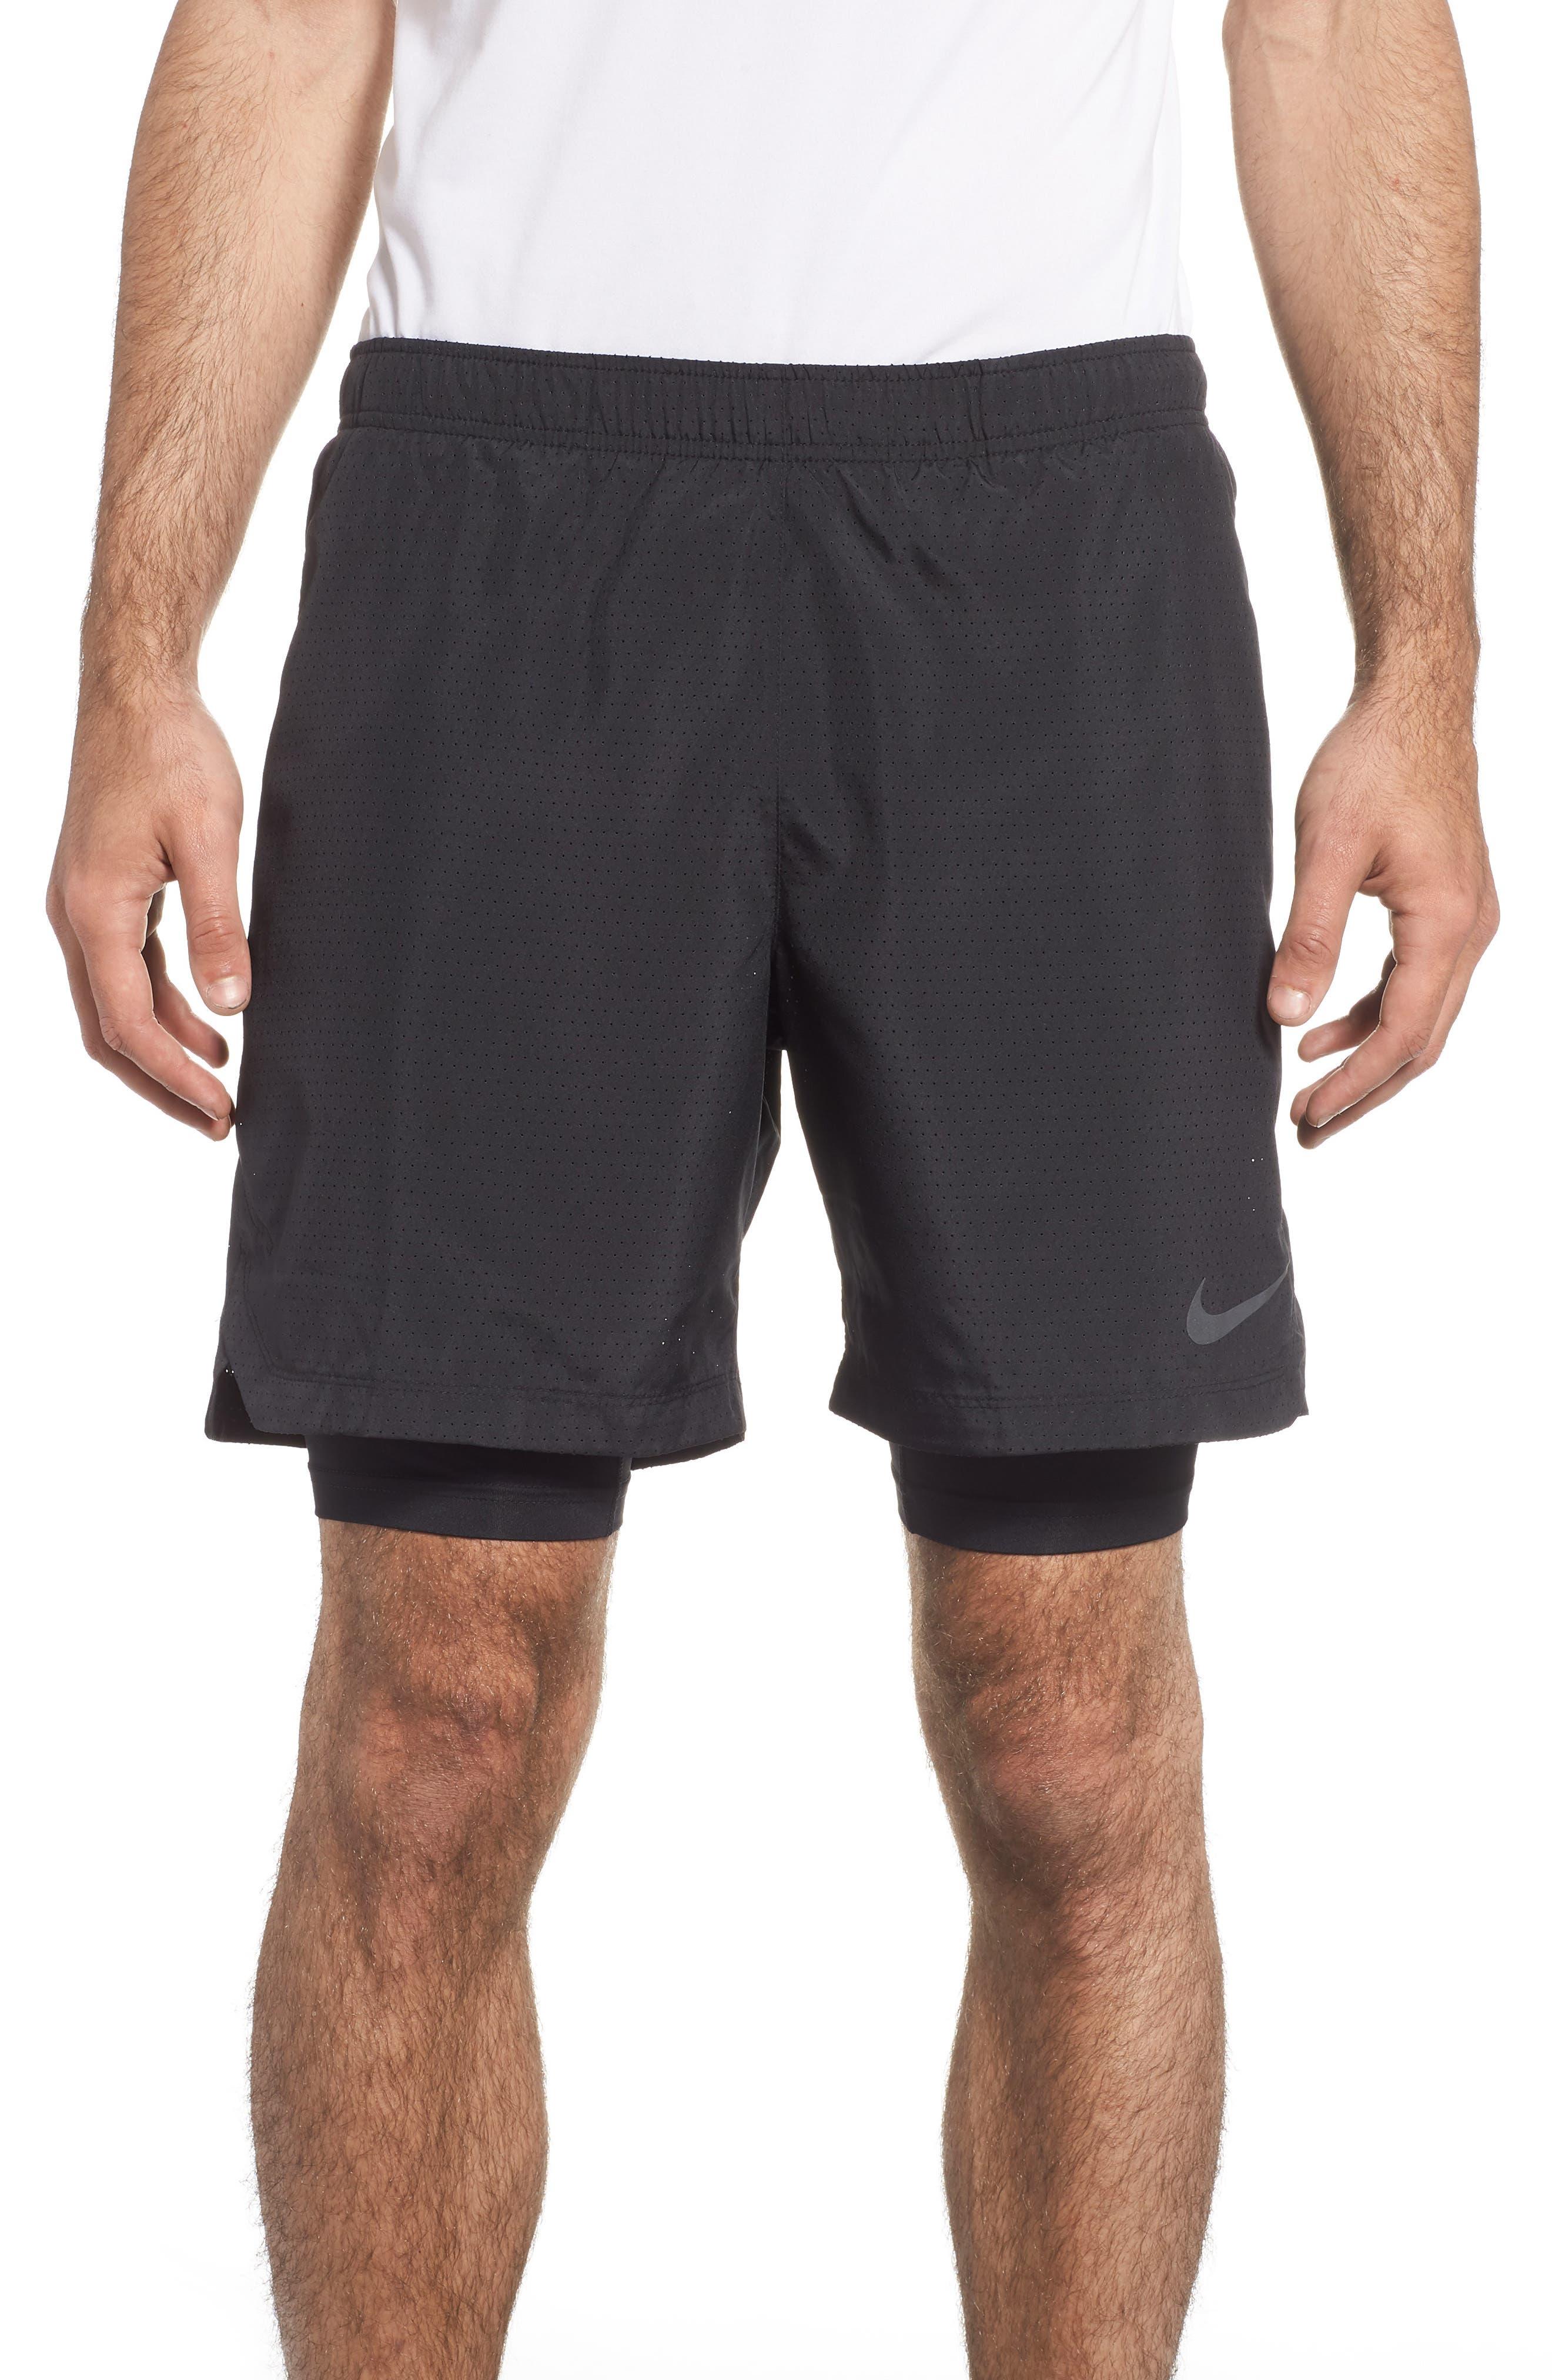 Running Challenger 2-in-1 Shorts,                             Main thumbnail 1, color,                             BLACK/ BLACK